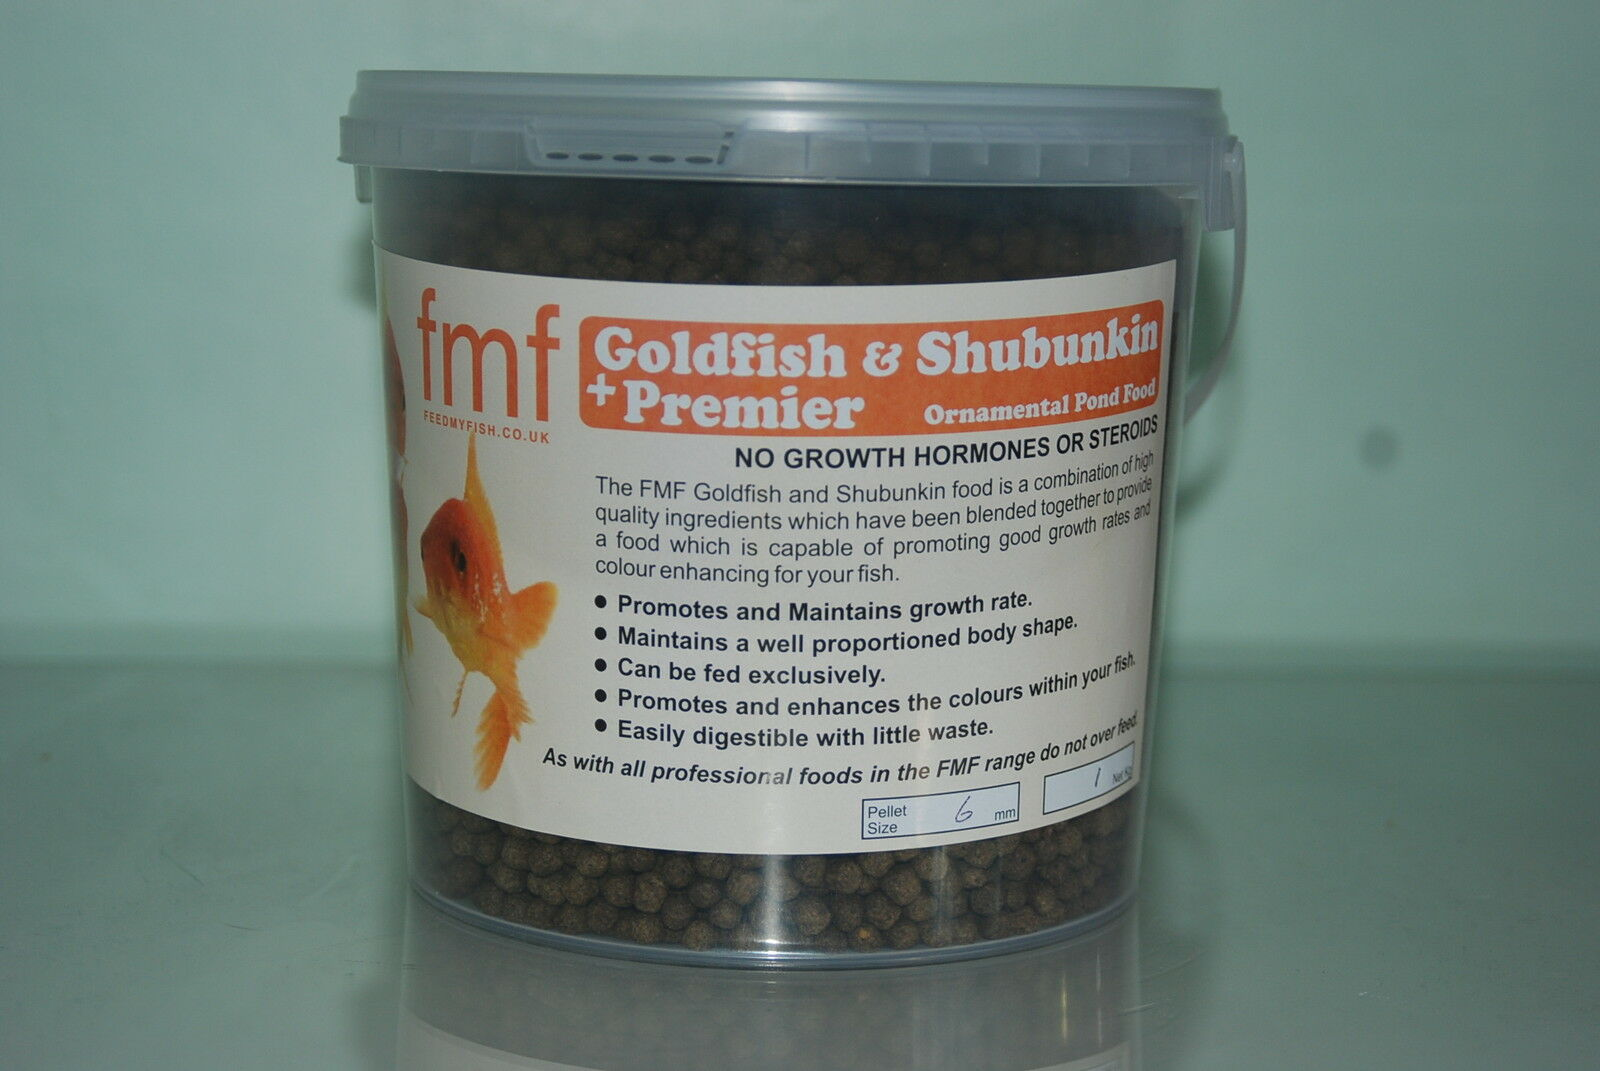 FMF Goldfisch & Ornamentalen Premier + Teich Fischfutter 4kg Eimer 3 mm Paletten